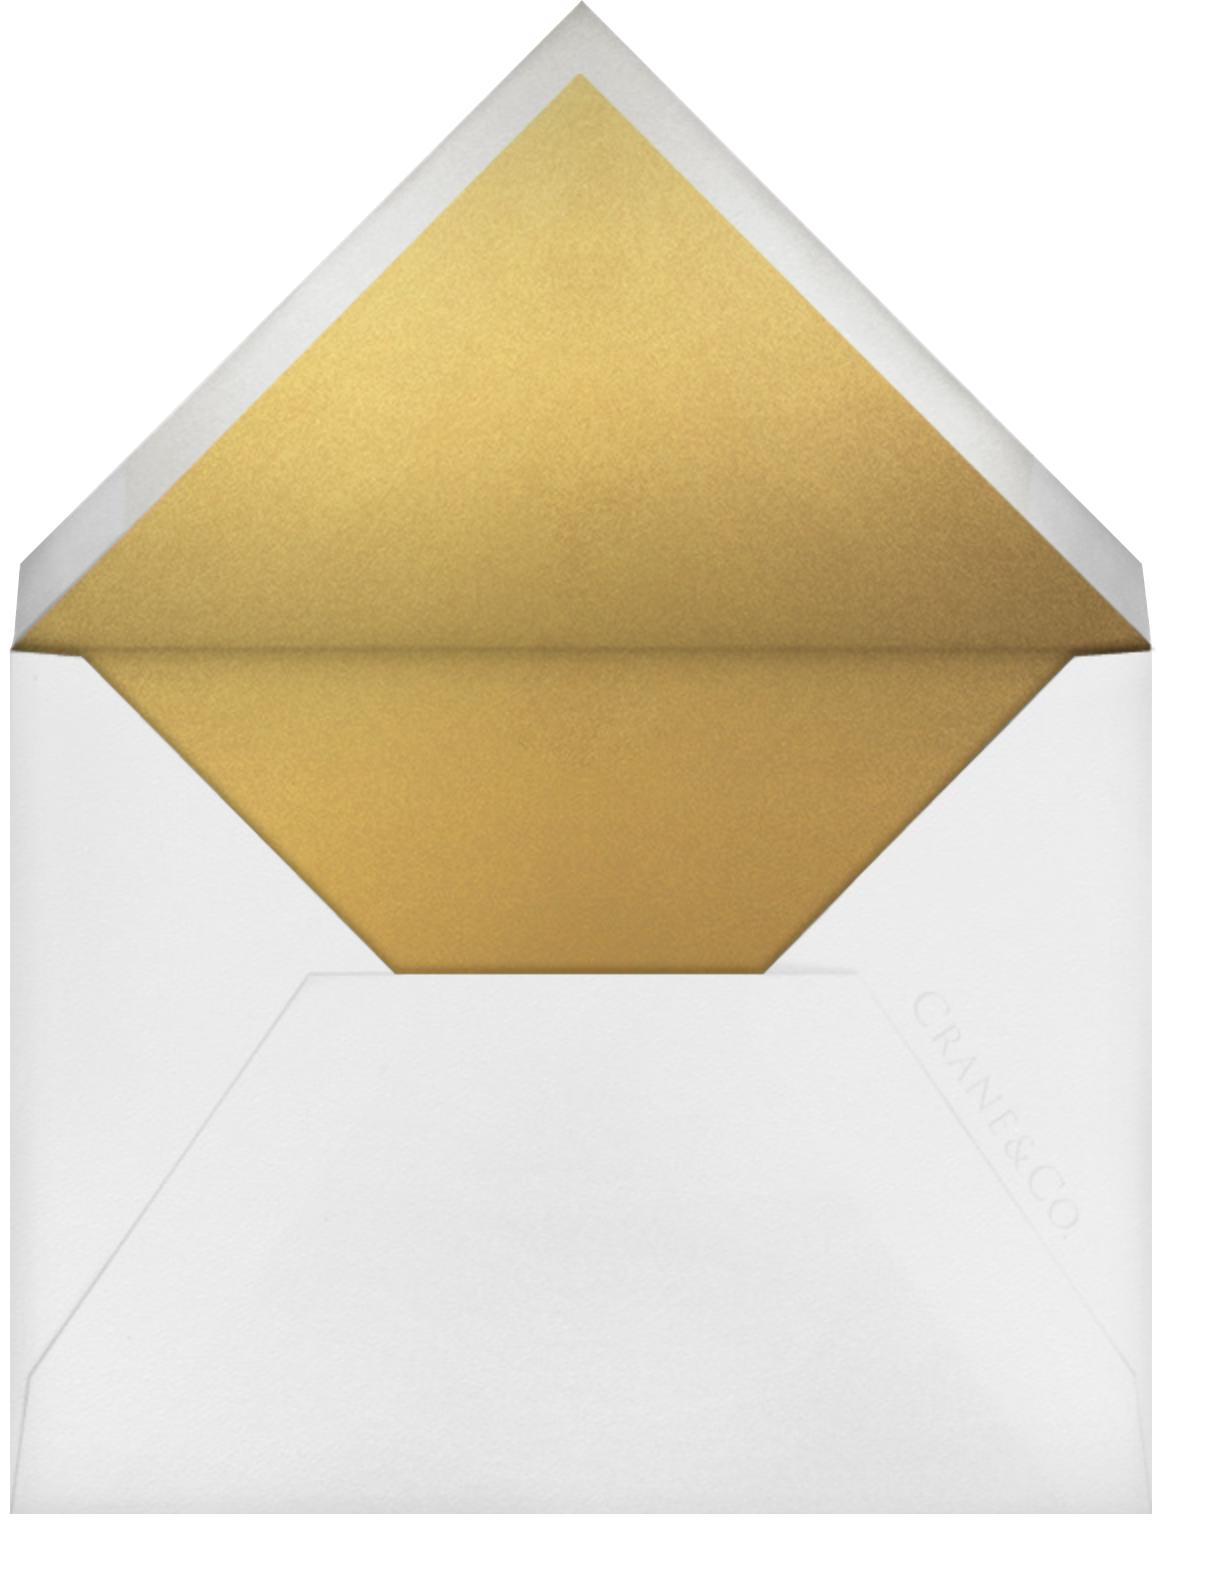 Stave (Invitation) - Vera Wang - All - envelope back